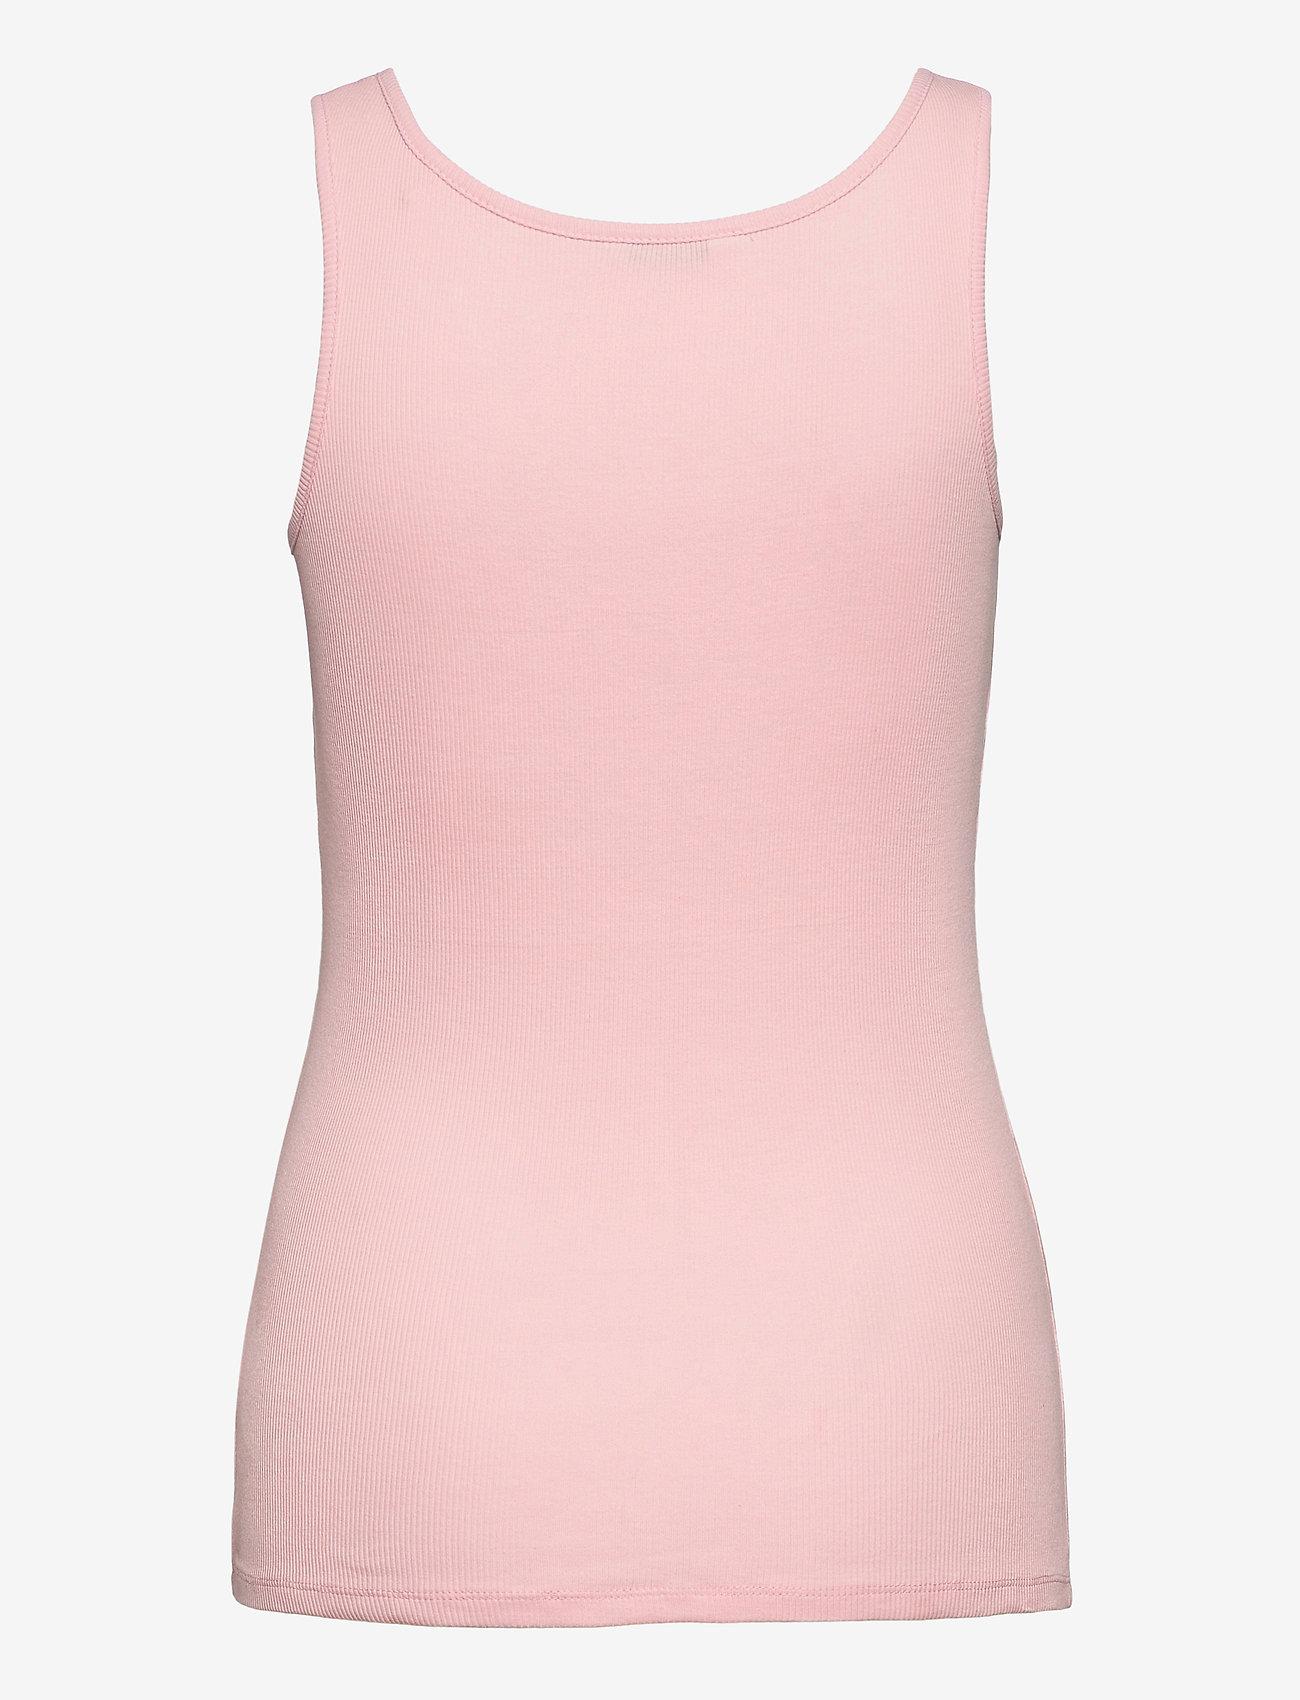 GUESS Jeans - ARLENE TANK TOP - linnen - alabaster pink - 1